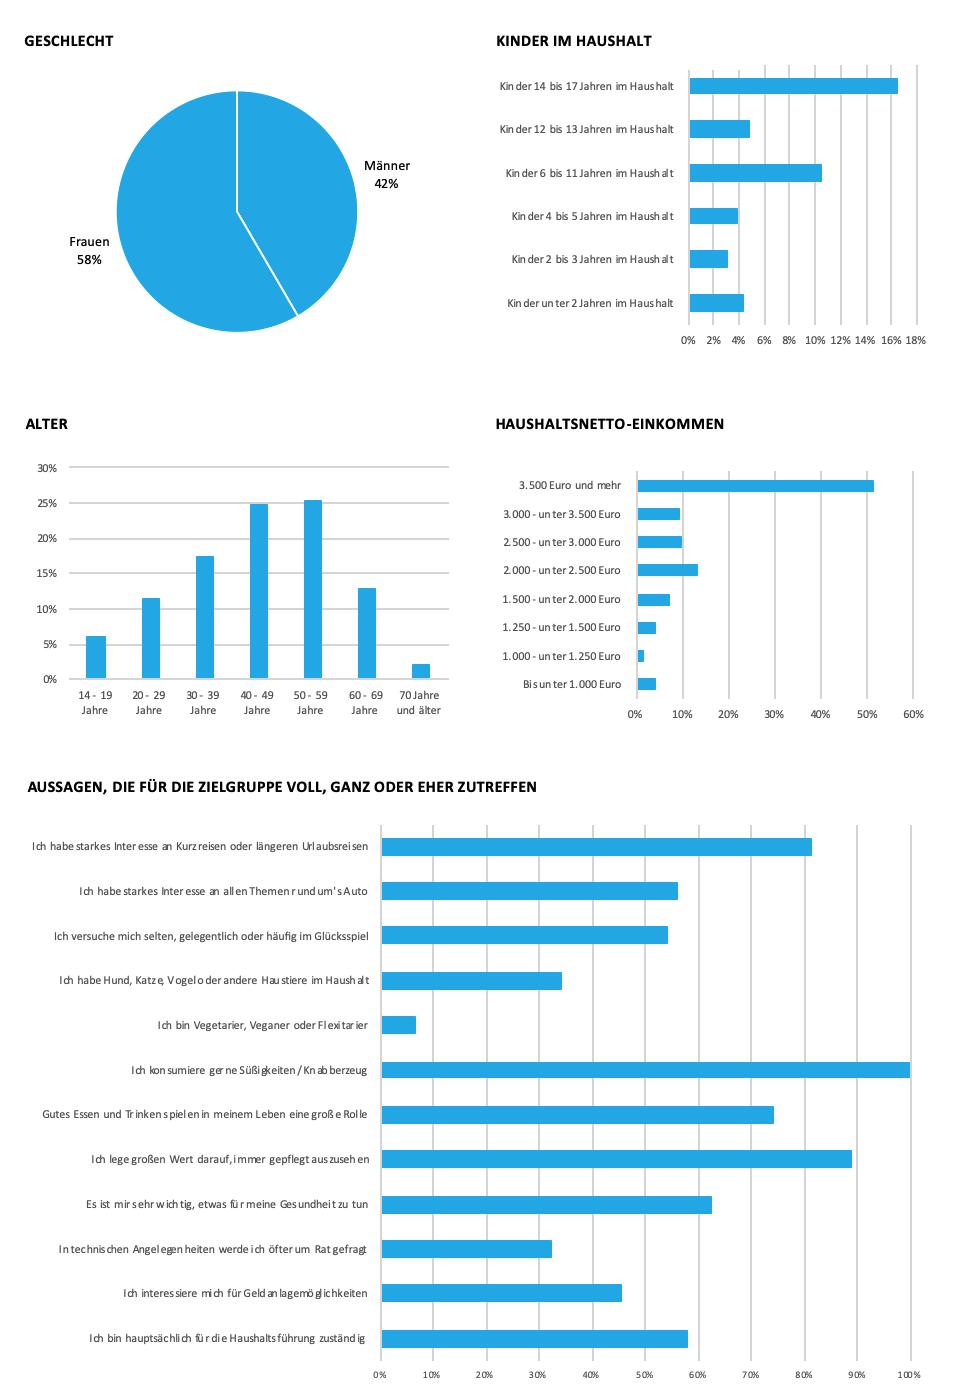 Grafik zu soziodemografischen Daten Brands4friends.de